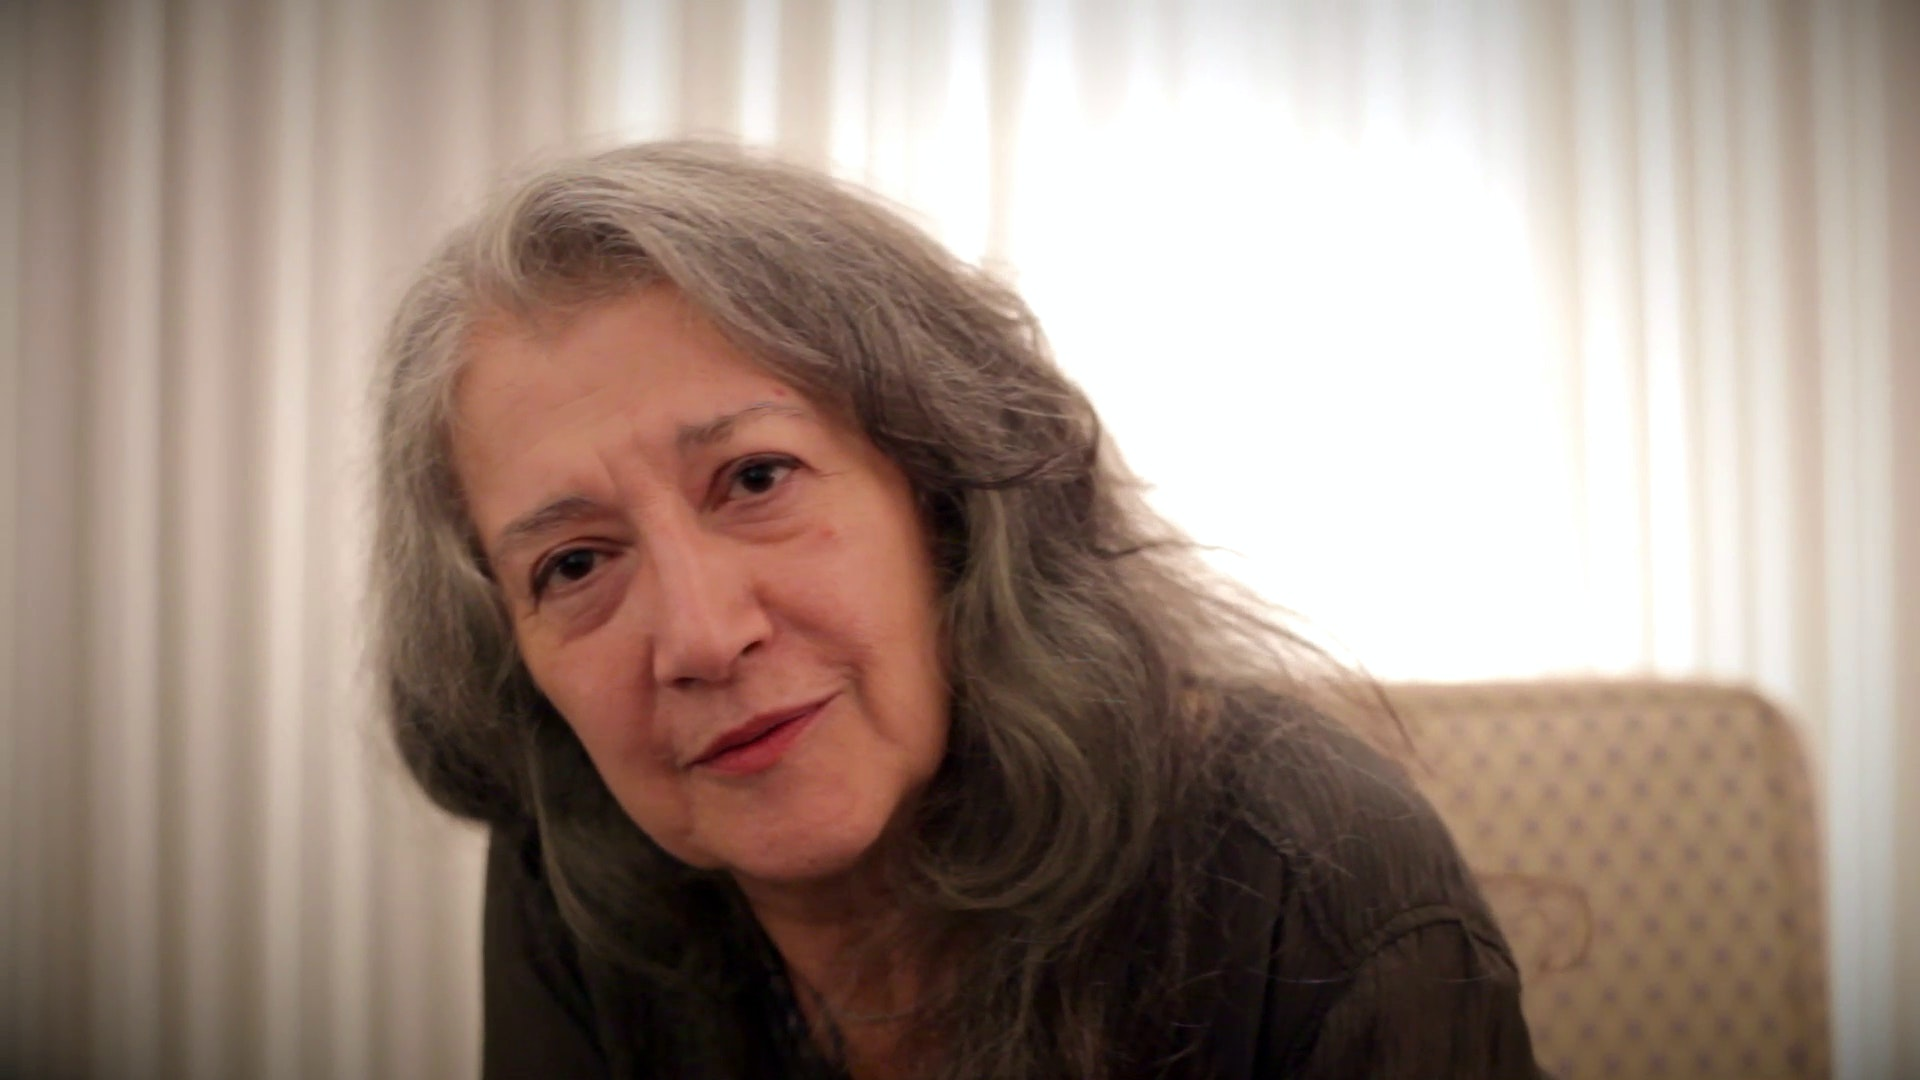 Marta Argerich: biography, awards, personal life